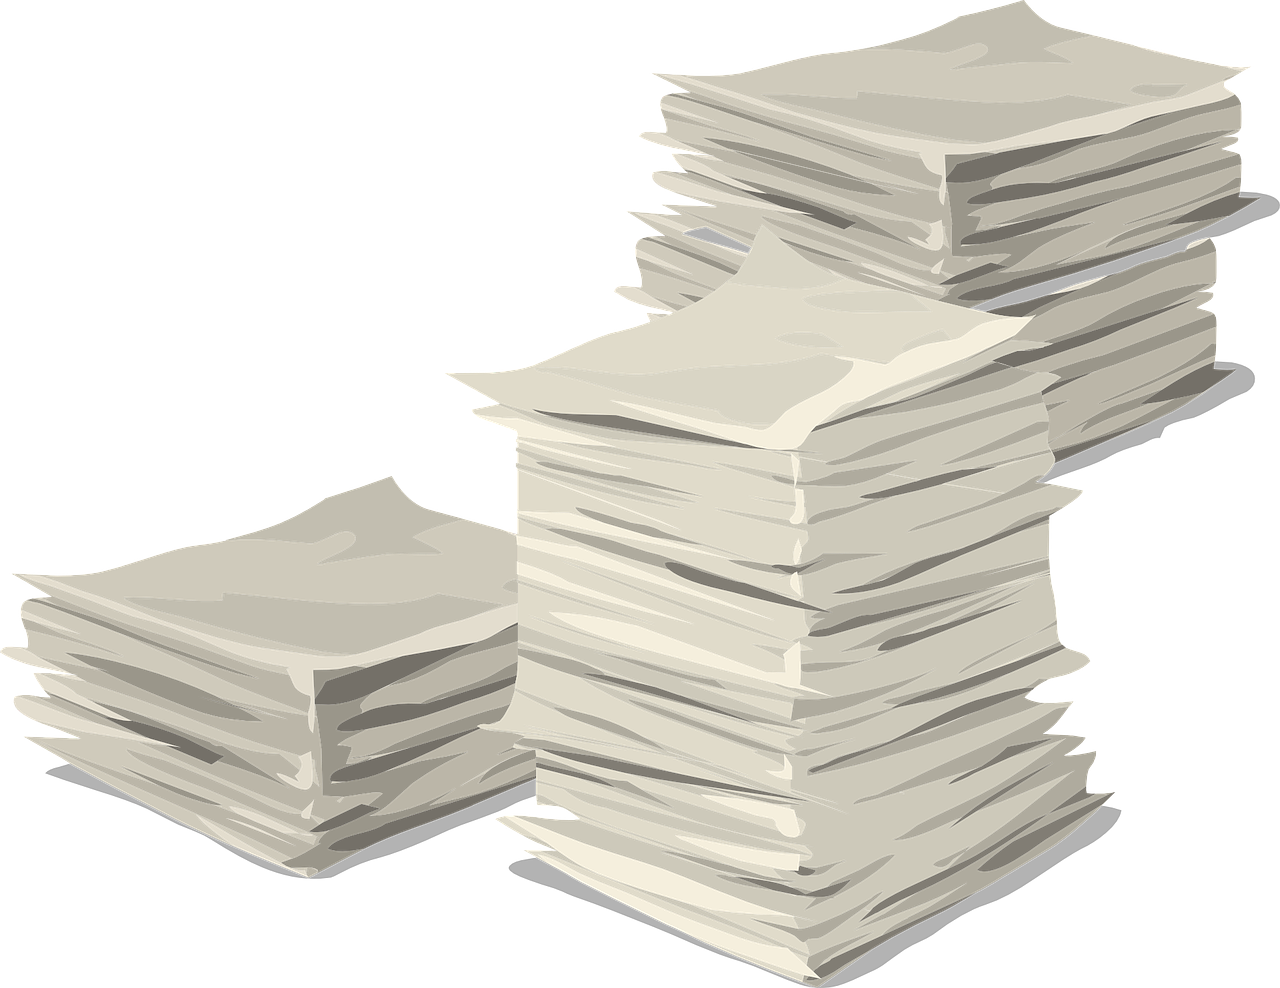 Paket mit Dokumenten geht verloren